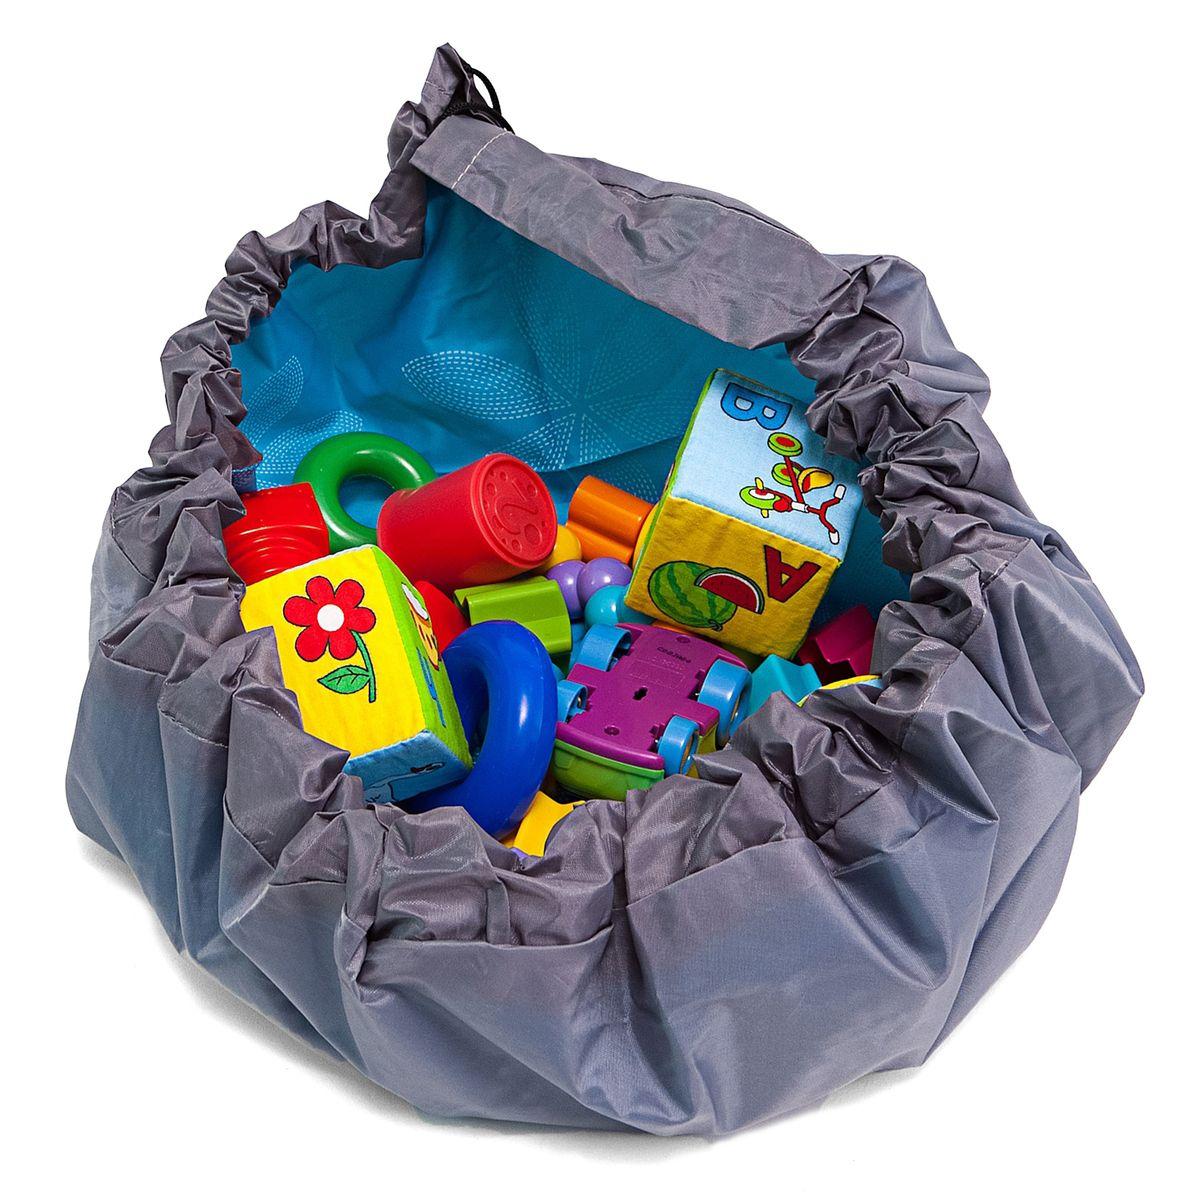 Сумка-коврик Homsu  Лужайка , цвет: голубой, 80х80 см - Подушки, пледы, коврики